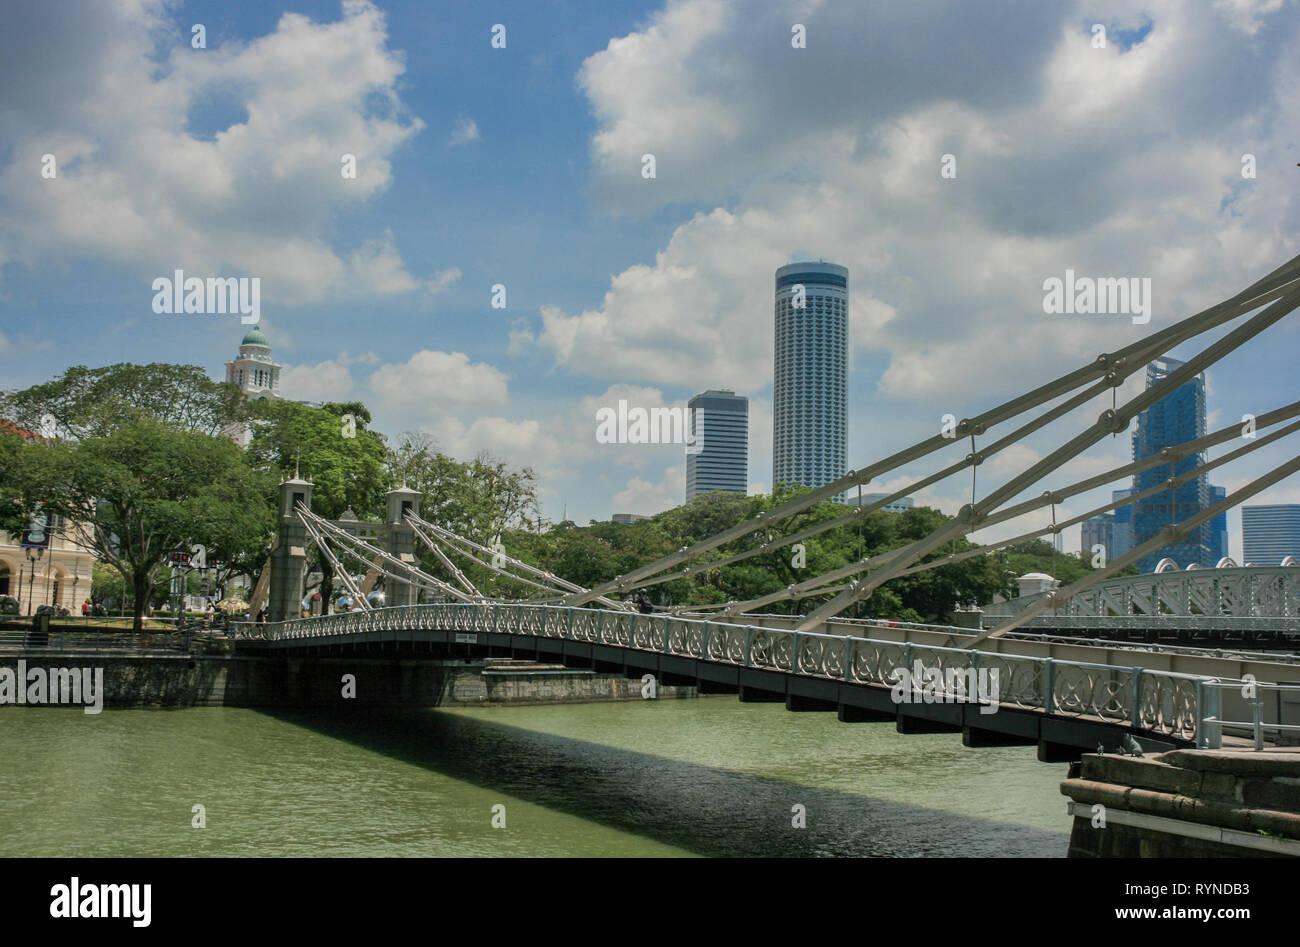 Cavenagh Bridge looking towards the Victoria Theatre, Singapore - Stock Image